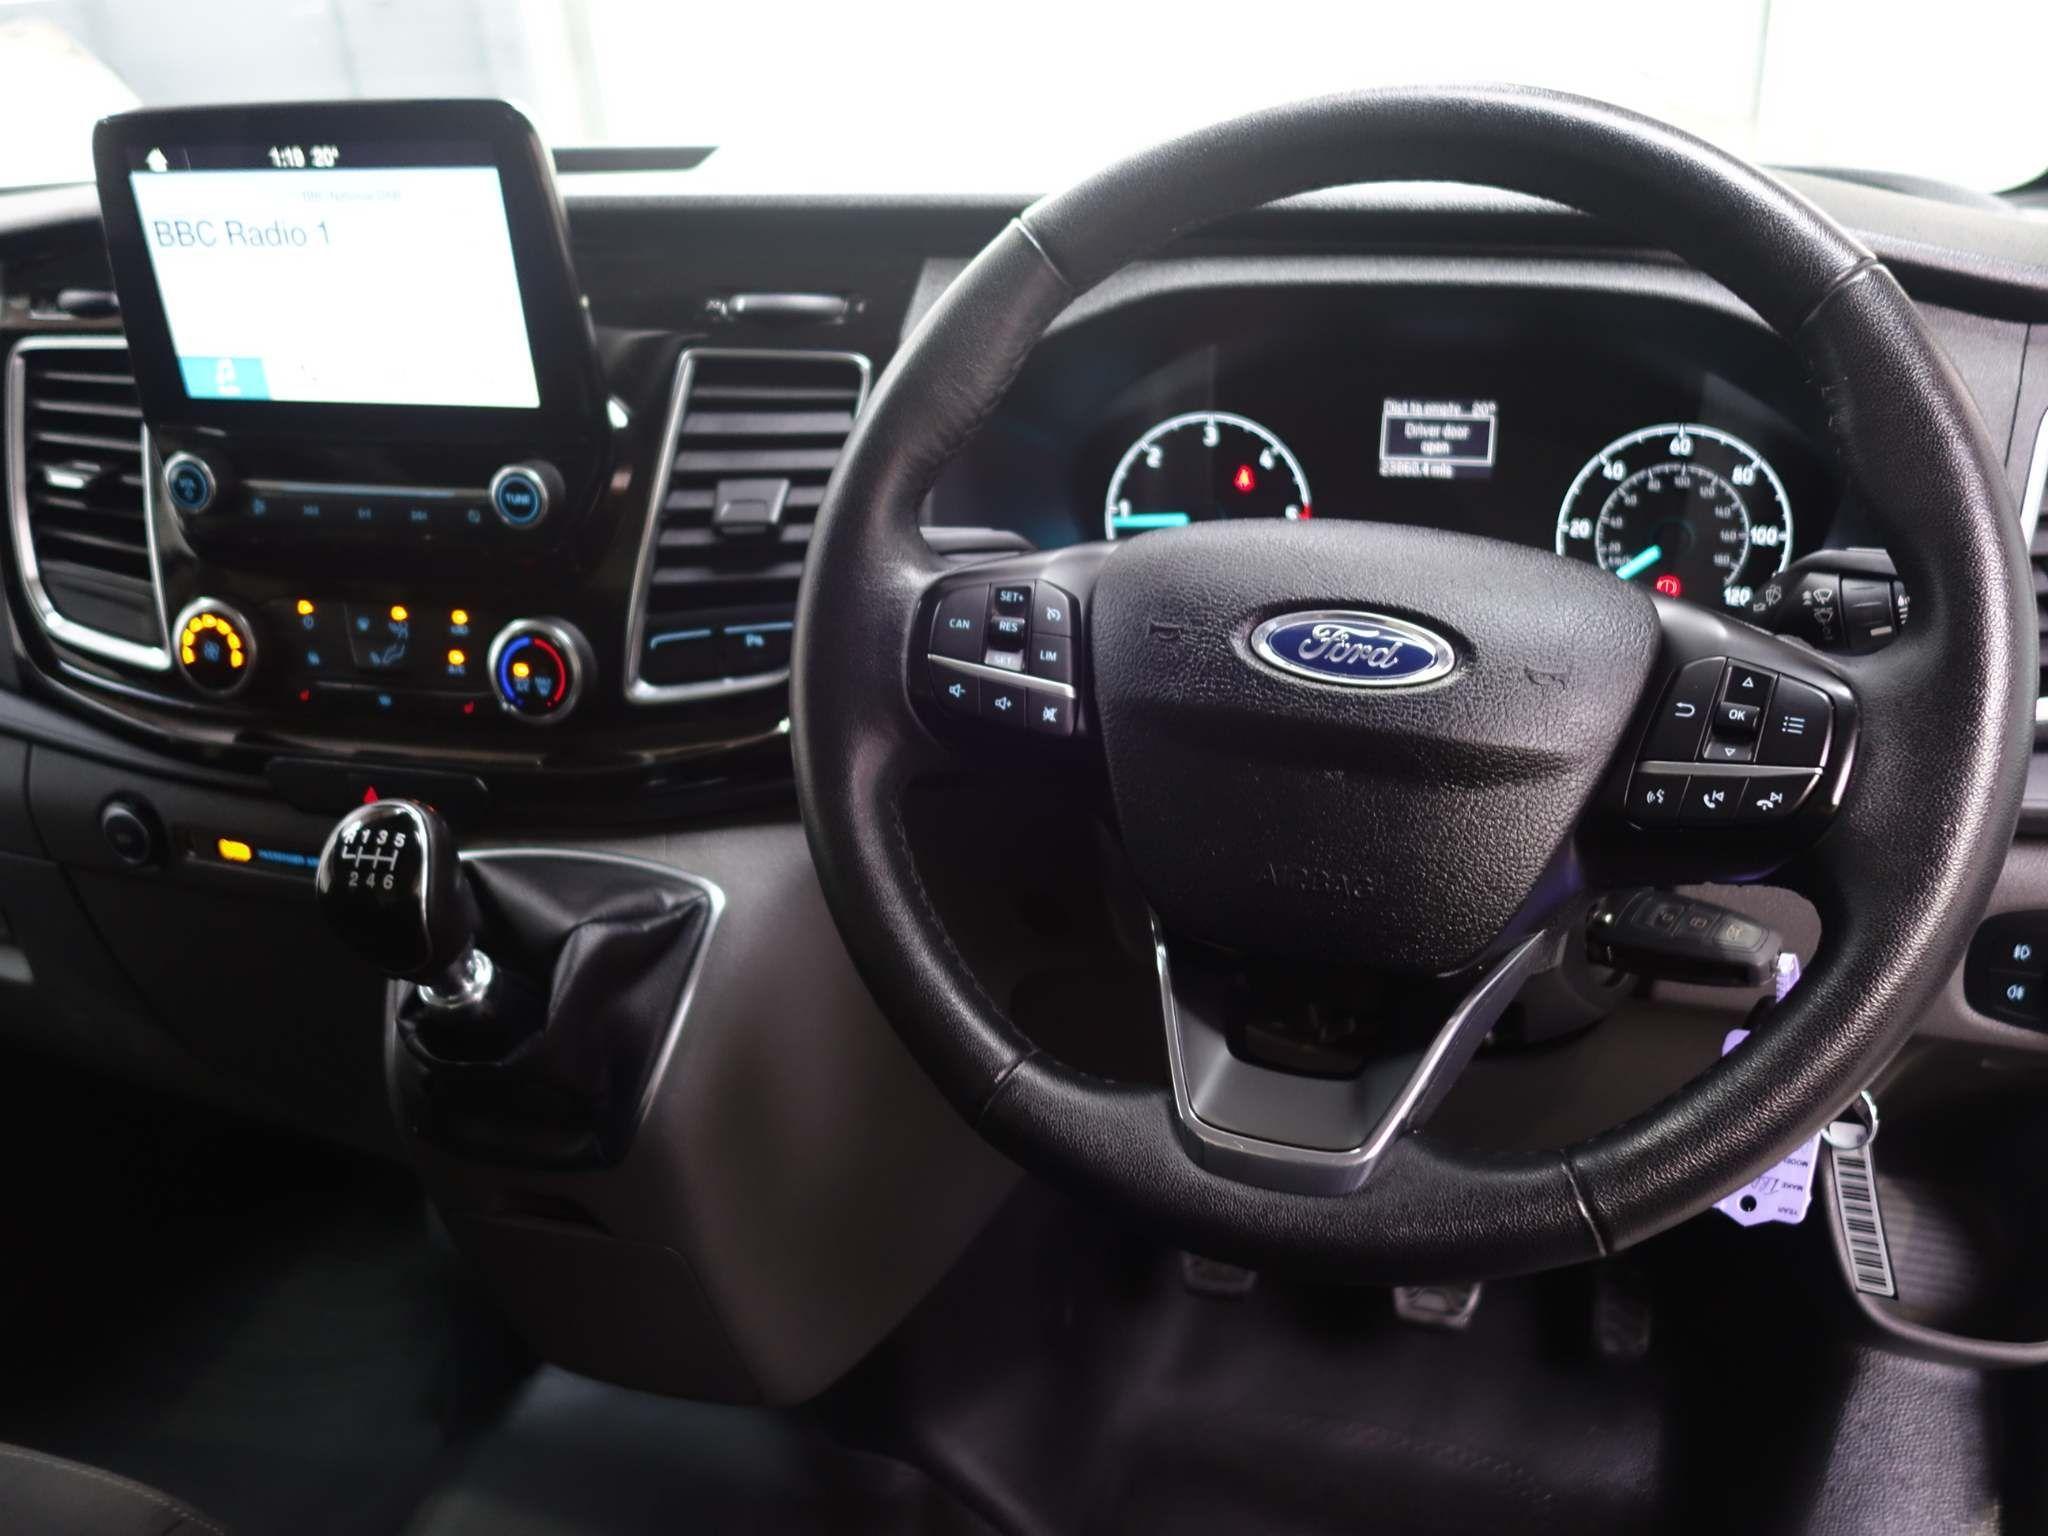 Ford Transit Custom 2.0 300 EcoBlue Limited L1 H1 EU6 5dr – WN19SVU